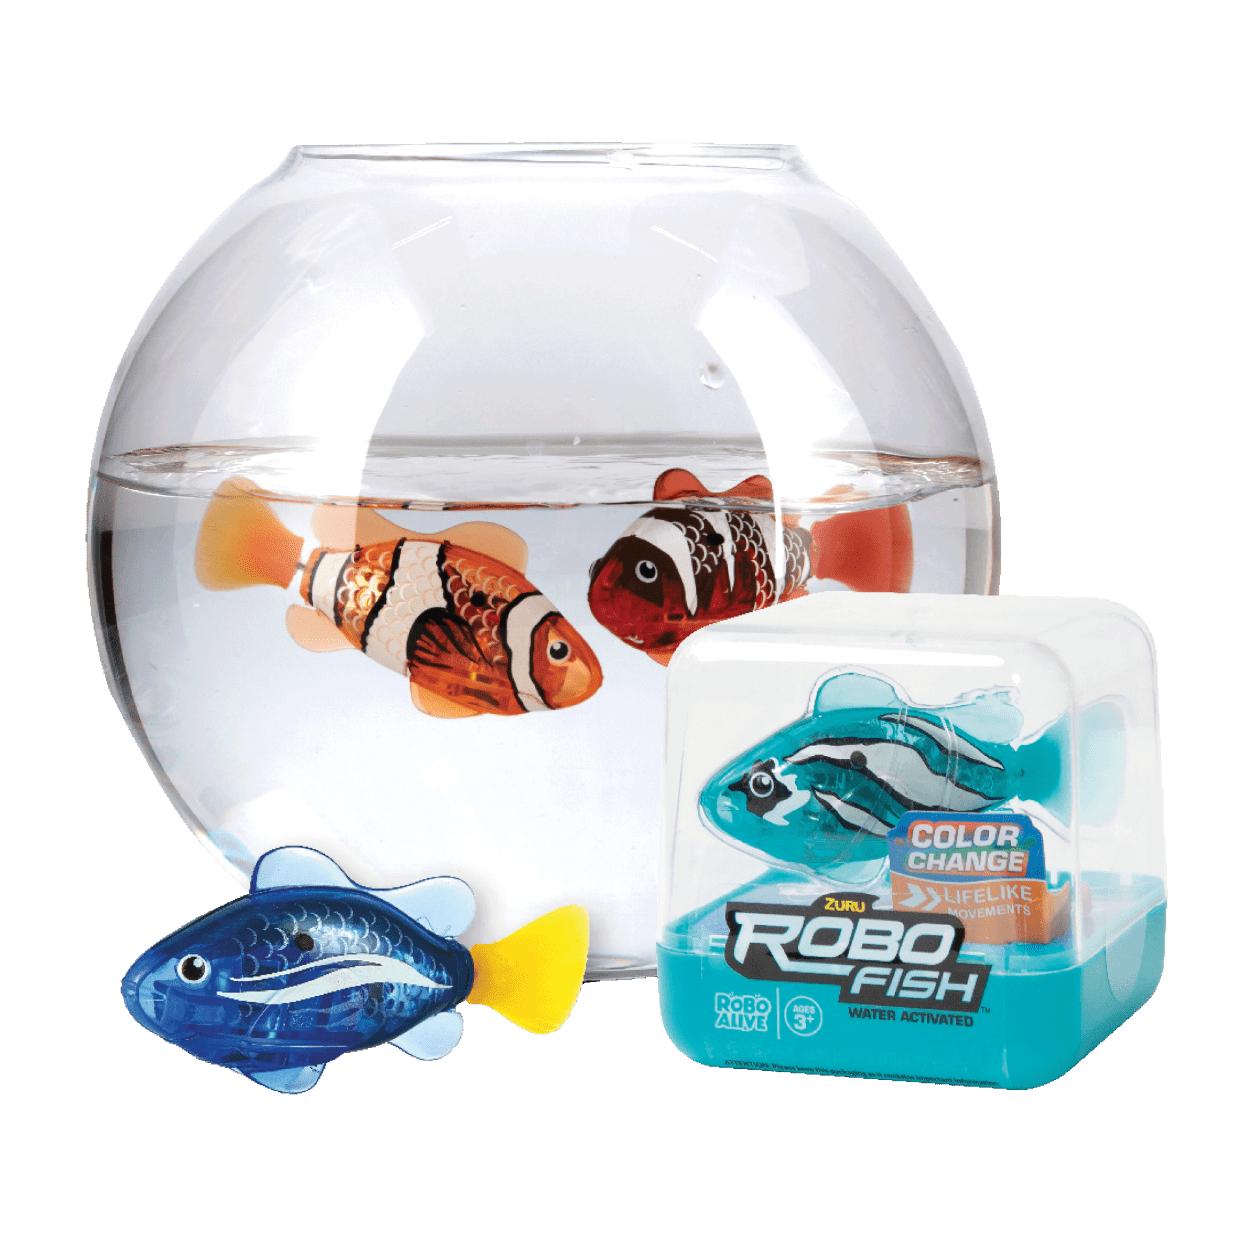 Robo fish bij de Aldi vanaf wo. 31-03